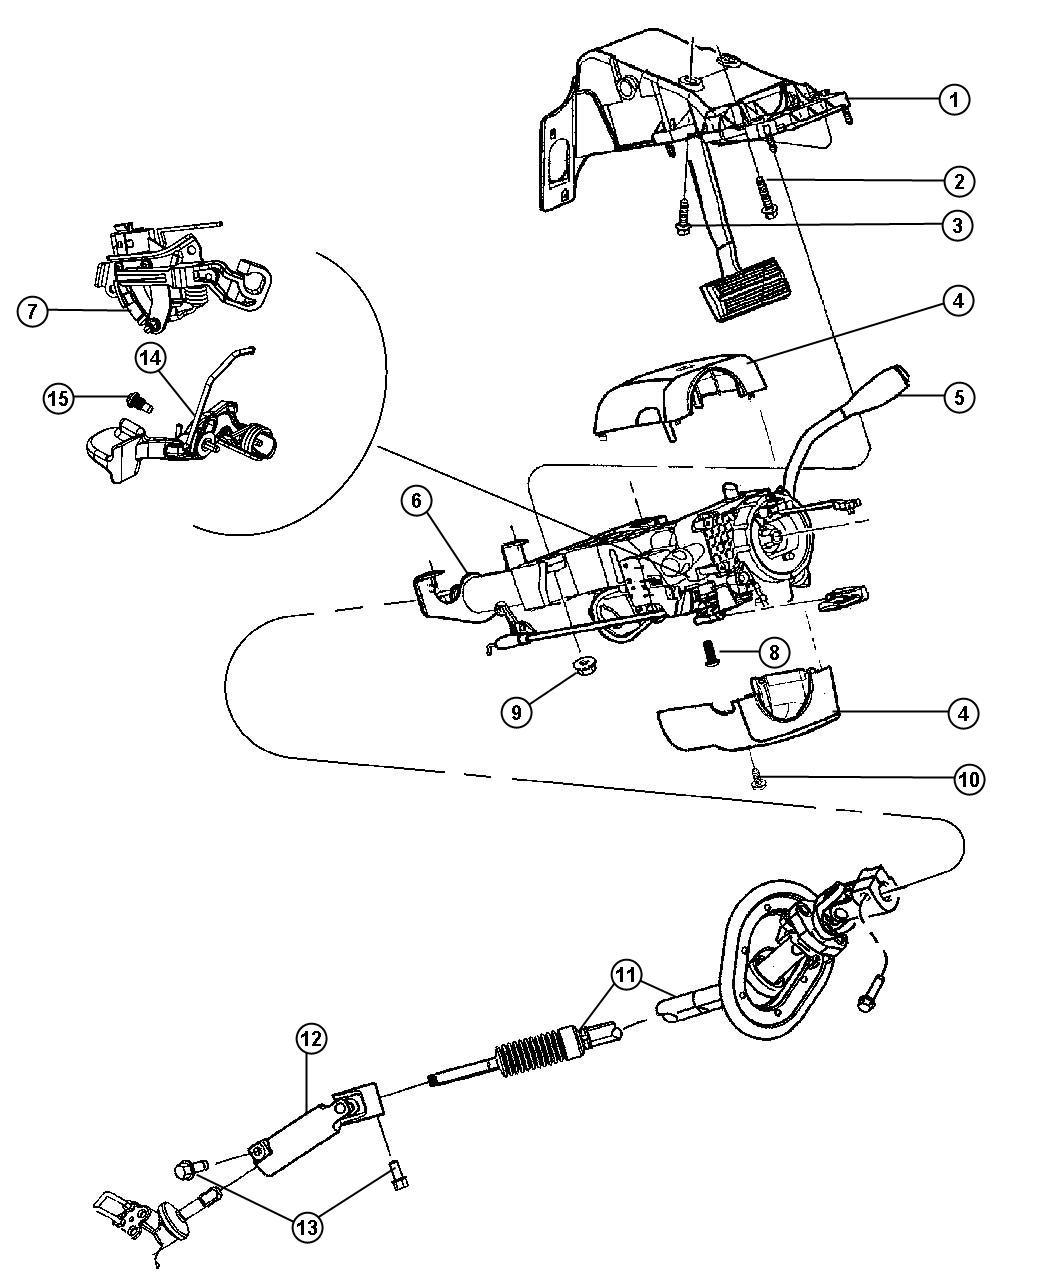 Ram Boot Gear Shift Lever Trim No Description